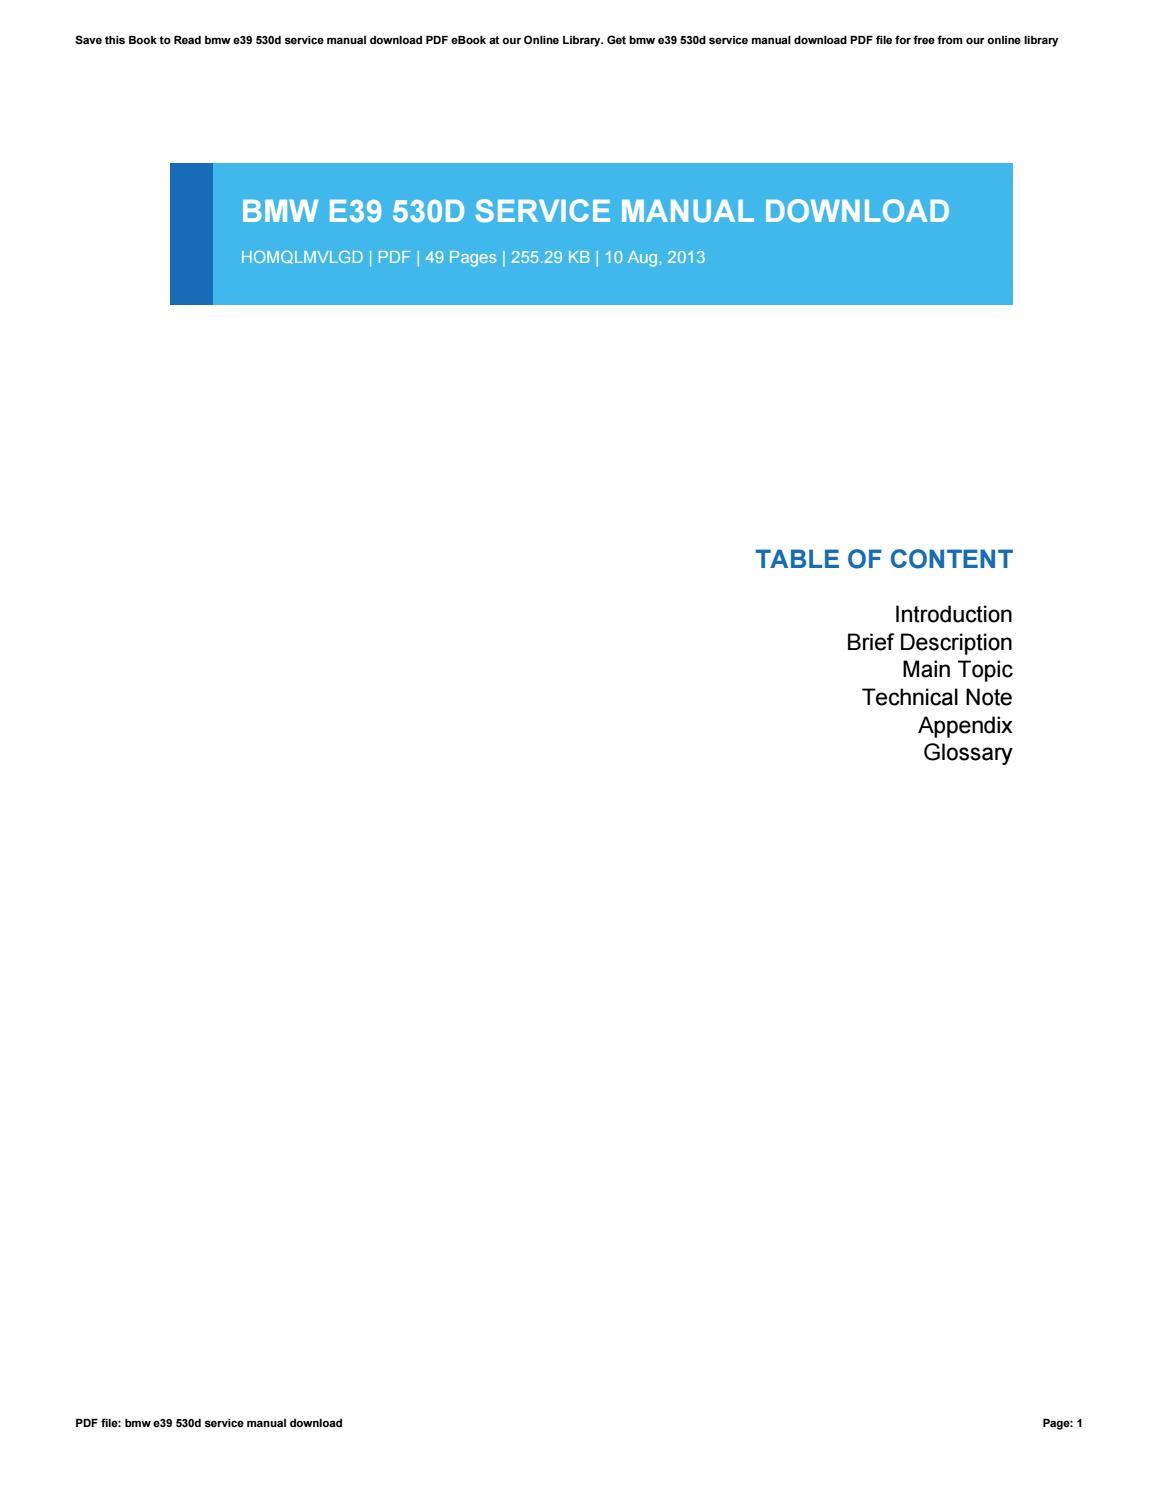 ... Array - e60 repair manual torrent ebook rh e60 repair manual torrent  ebook ballew us